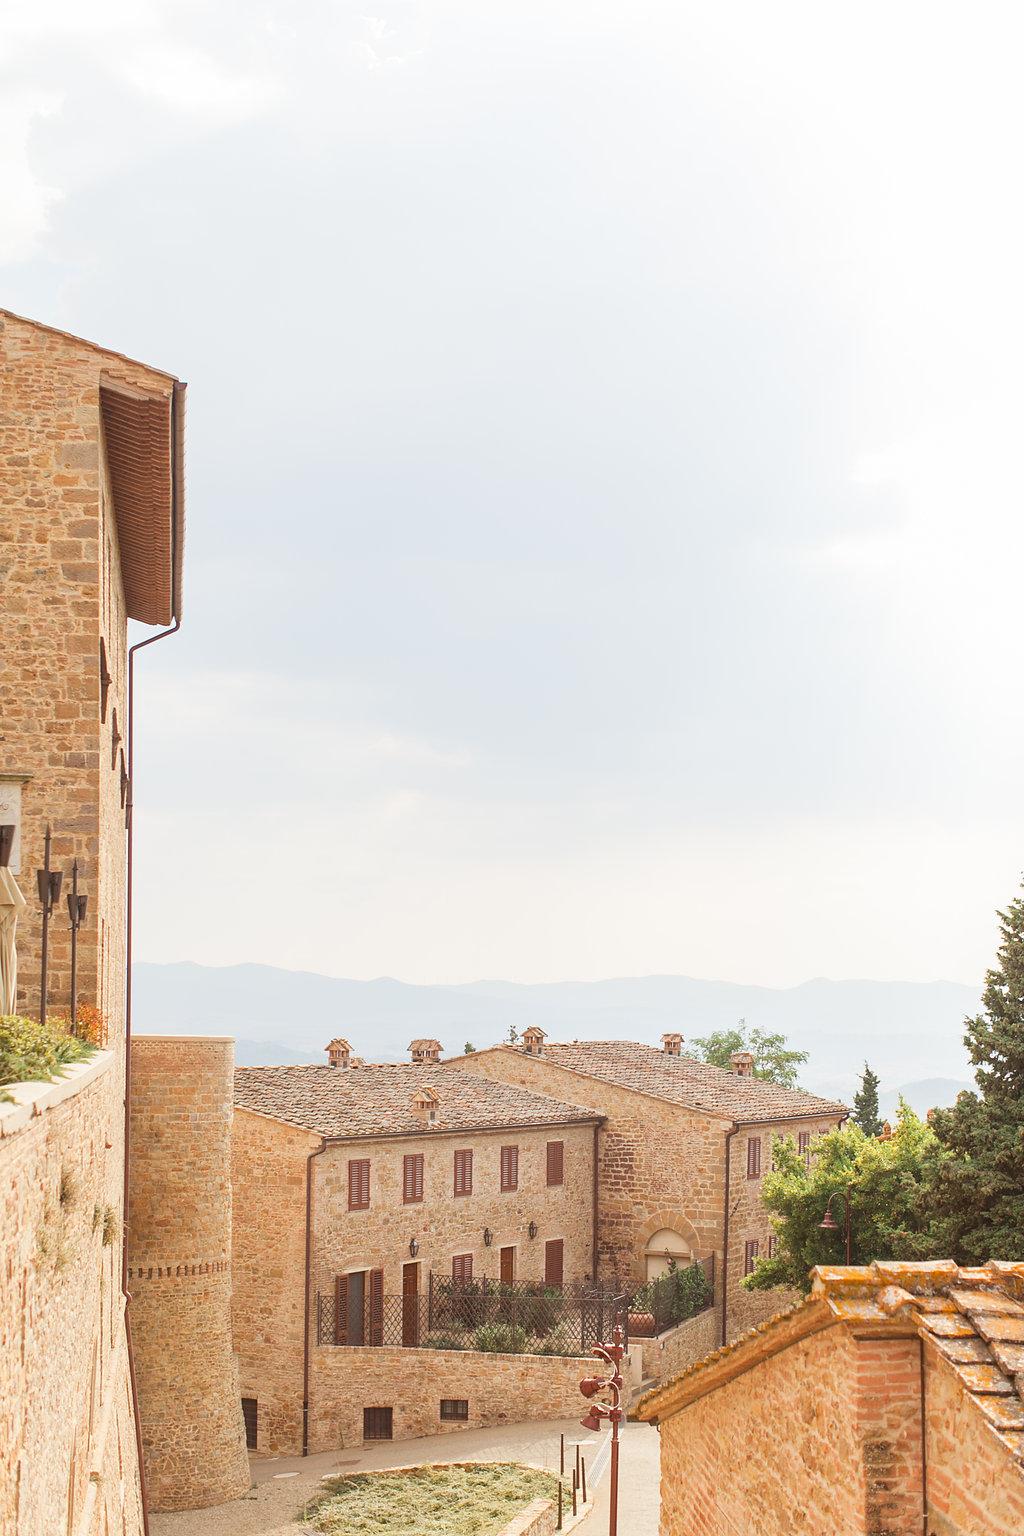 castelfalfi-tuscany-wedding-photographer-roberta-facchini-125